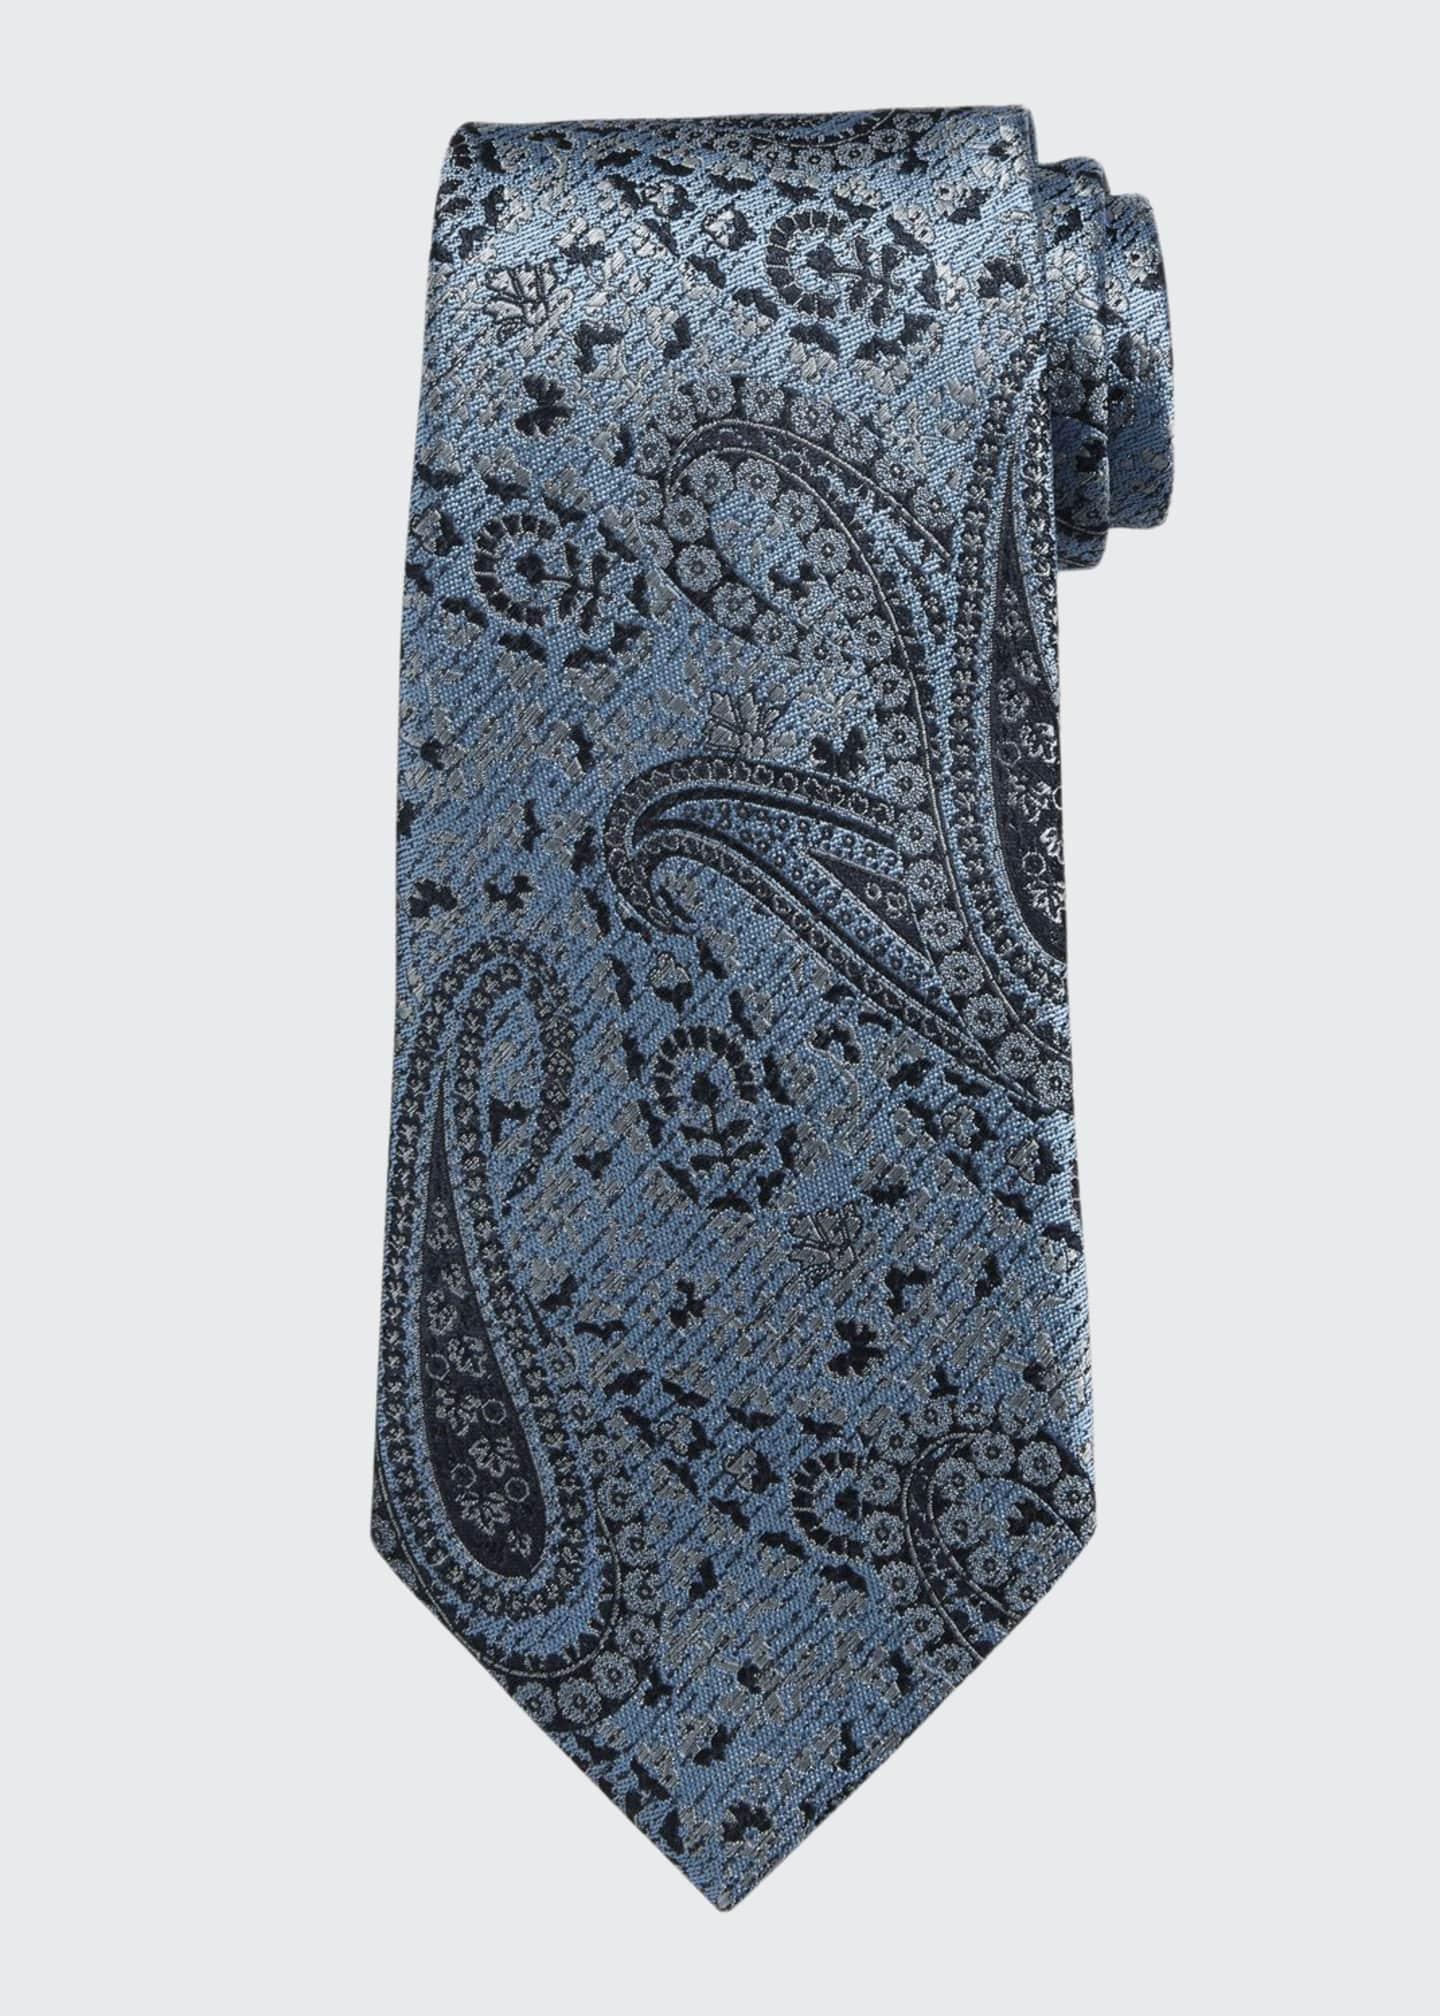 Ermenegildo Zegna Woven Paisley Silk Tie, Blue